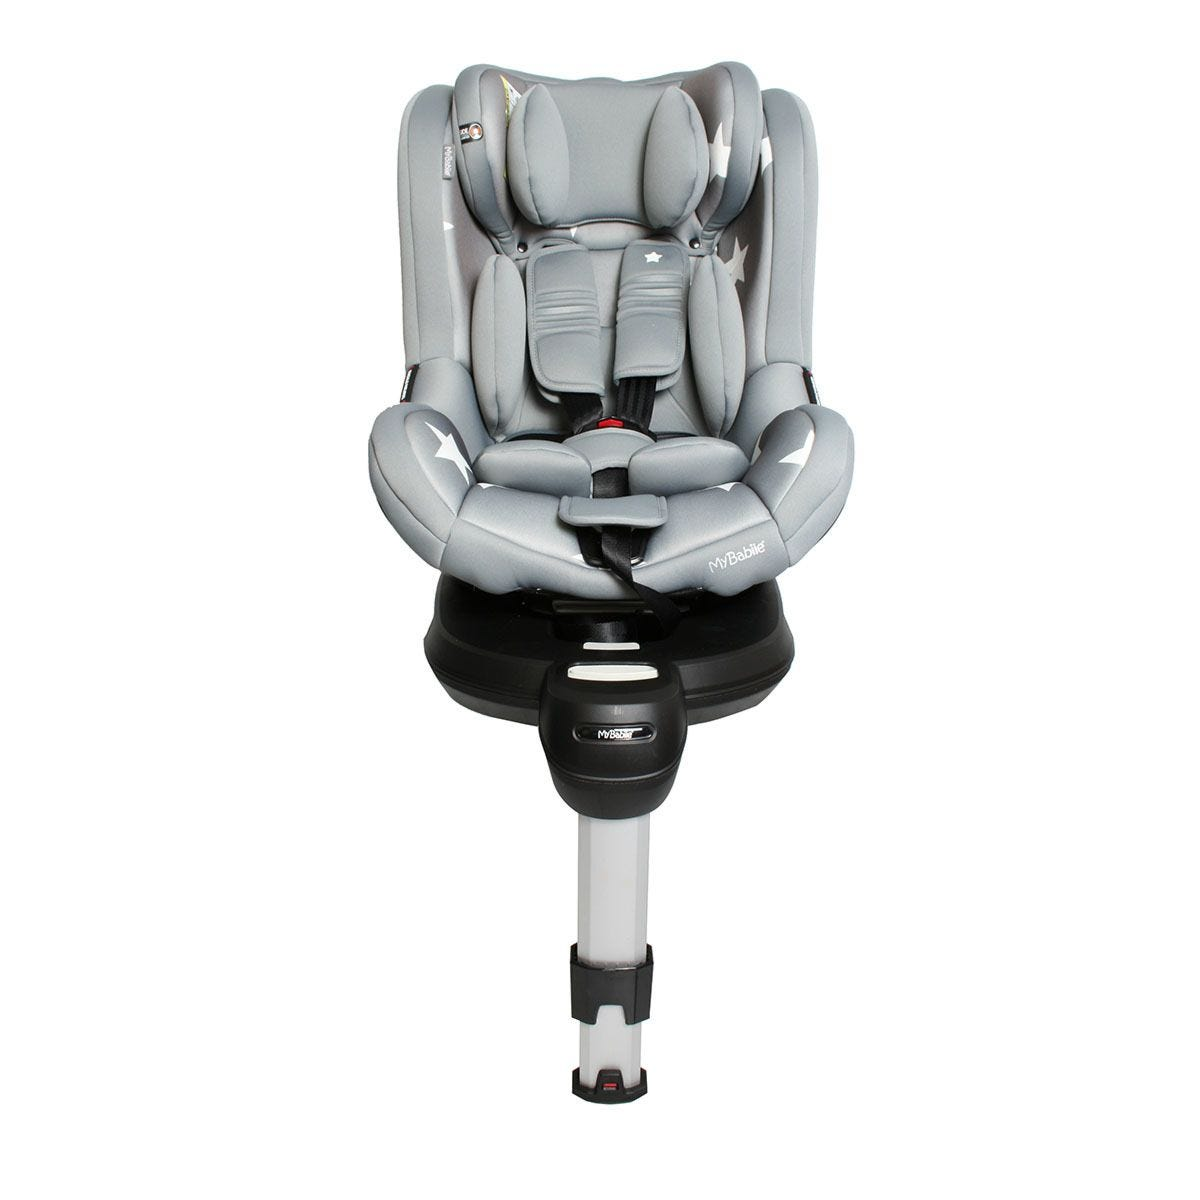 My Babiie Orbit Group 0+/1 Spin Car Seat - Grey Stars